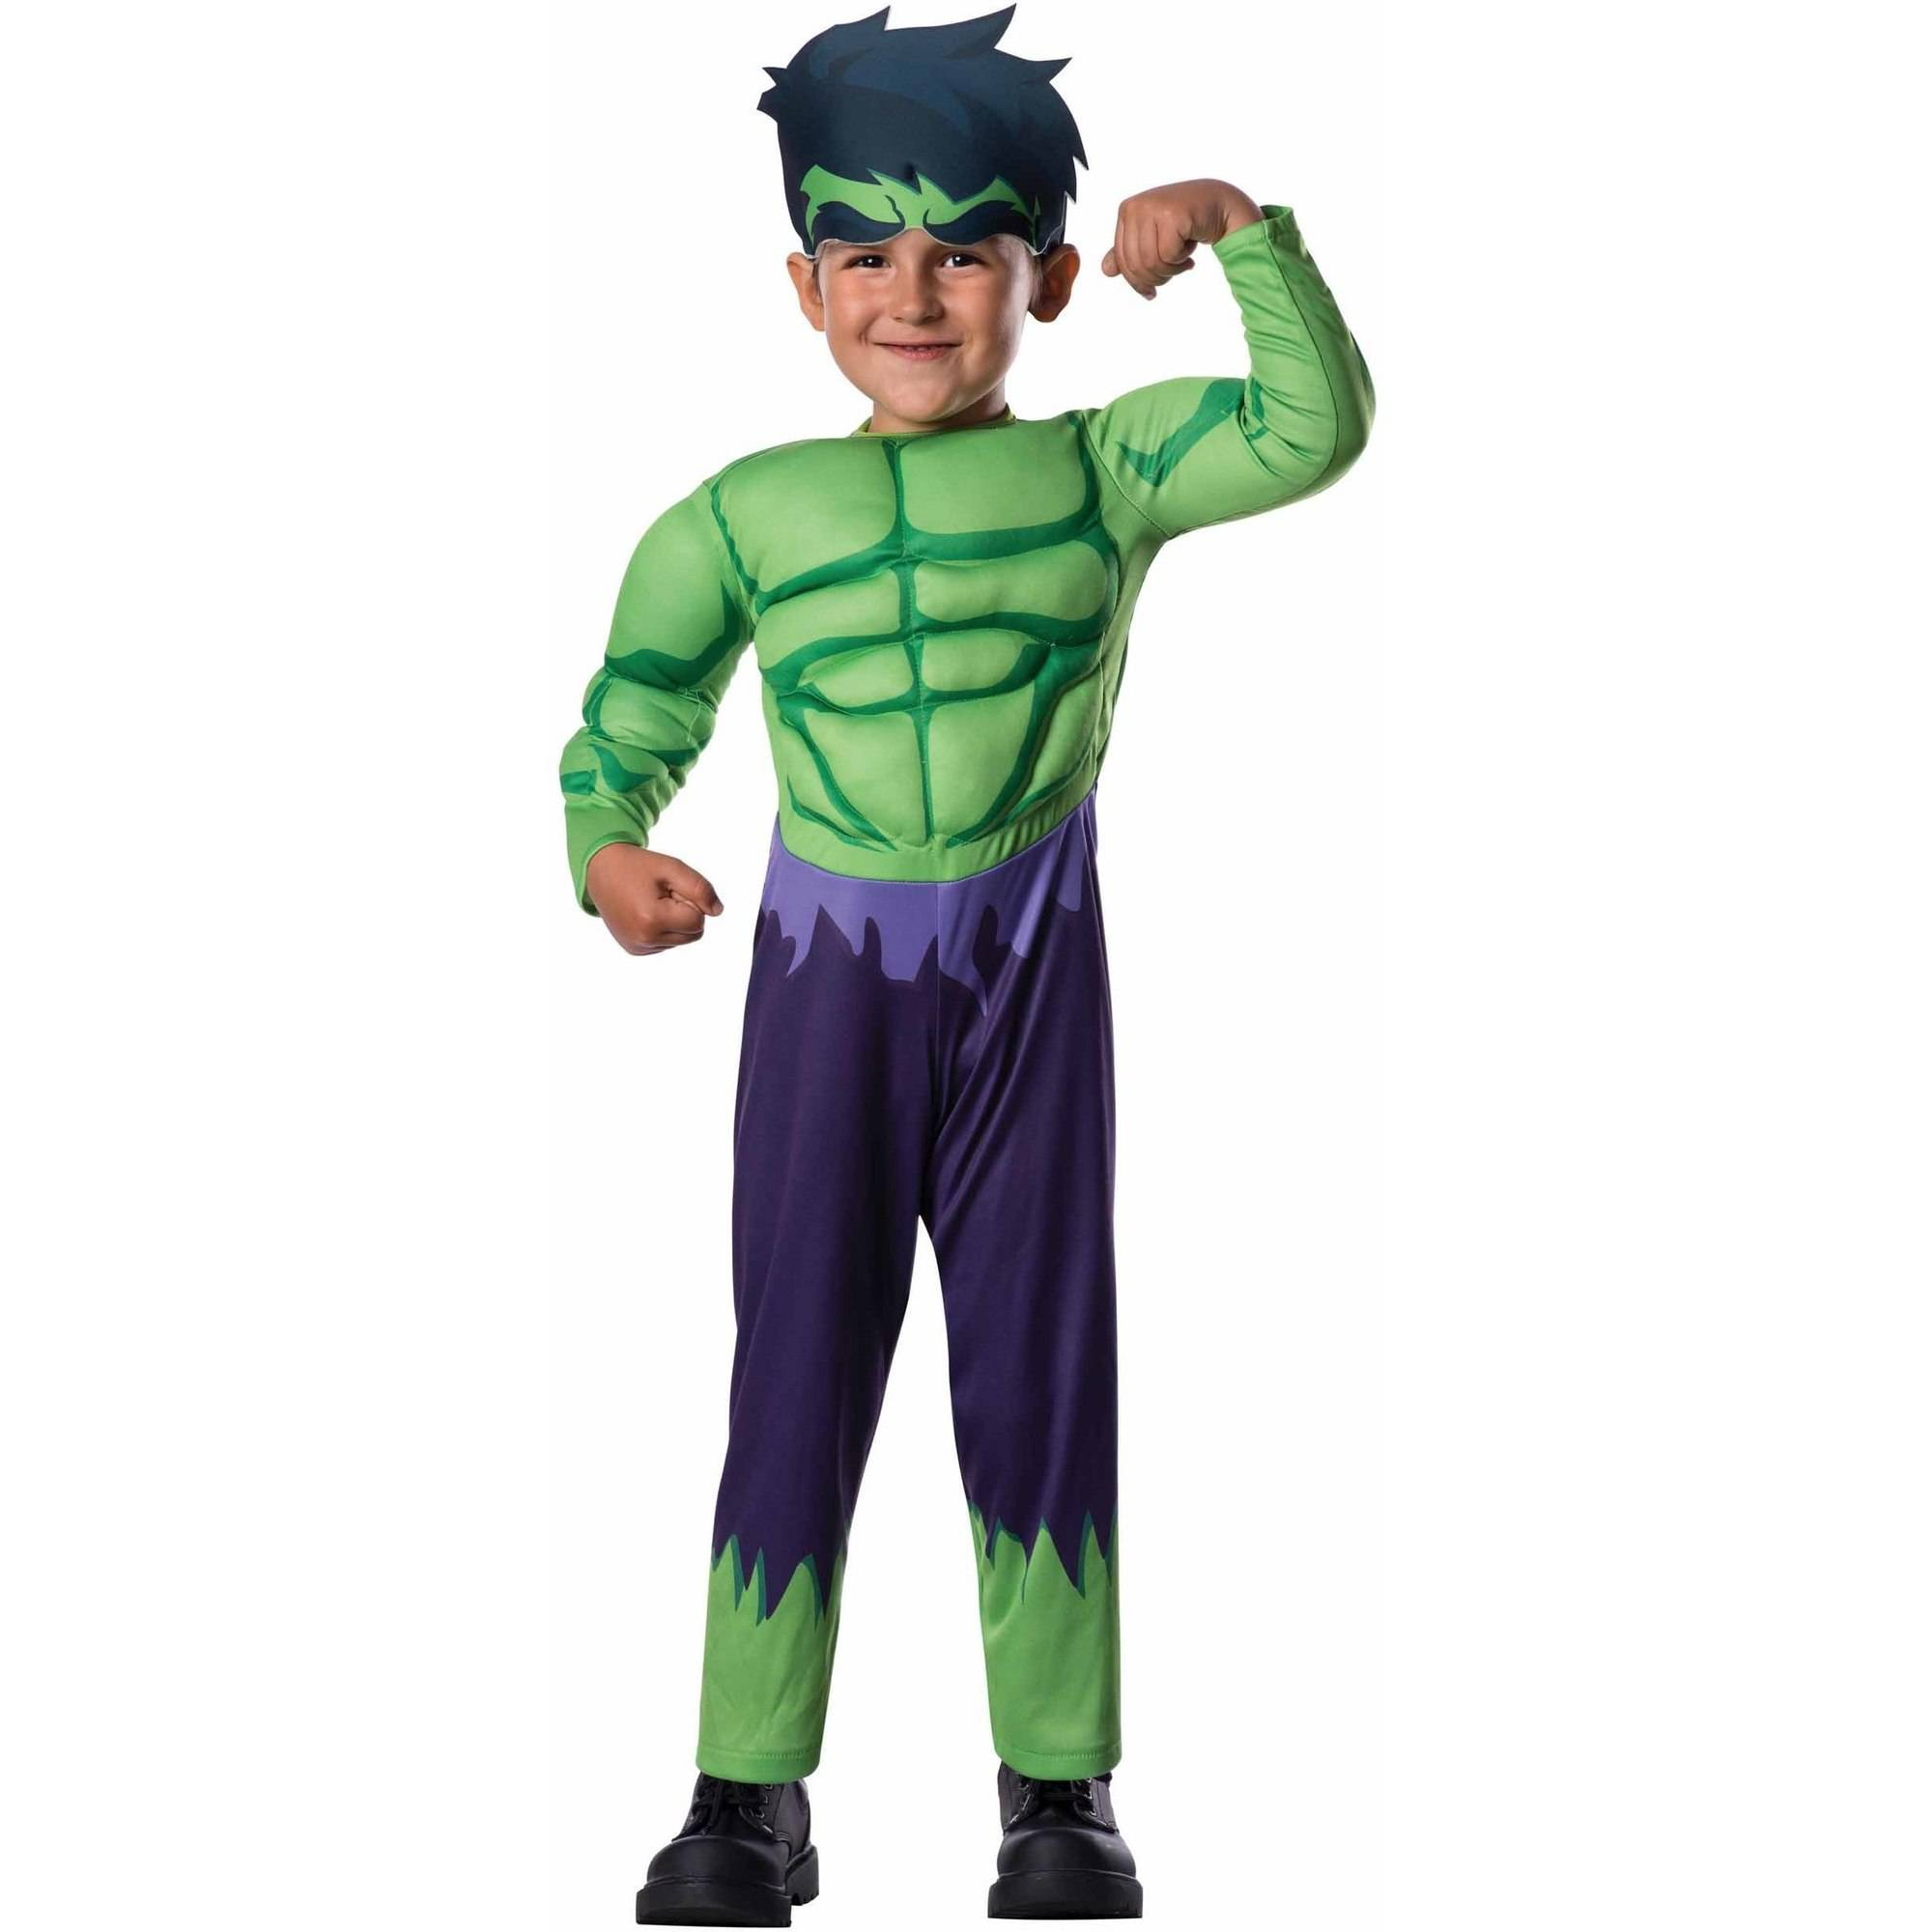 Rubies Hulk Toddler's Costume, size 3T-4T